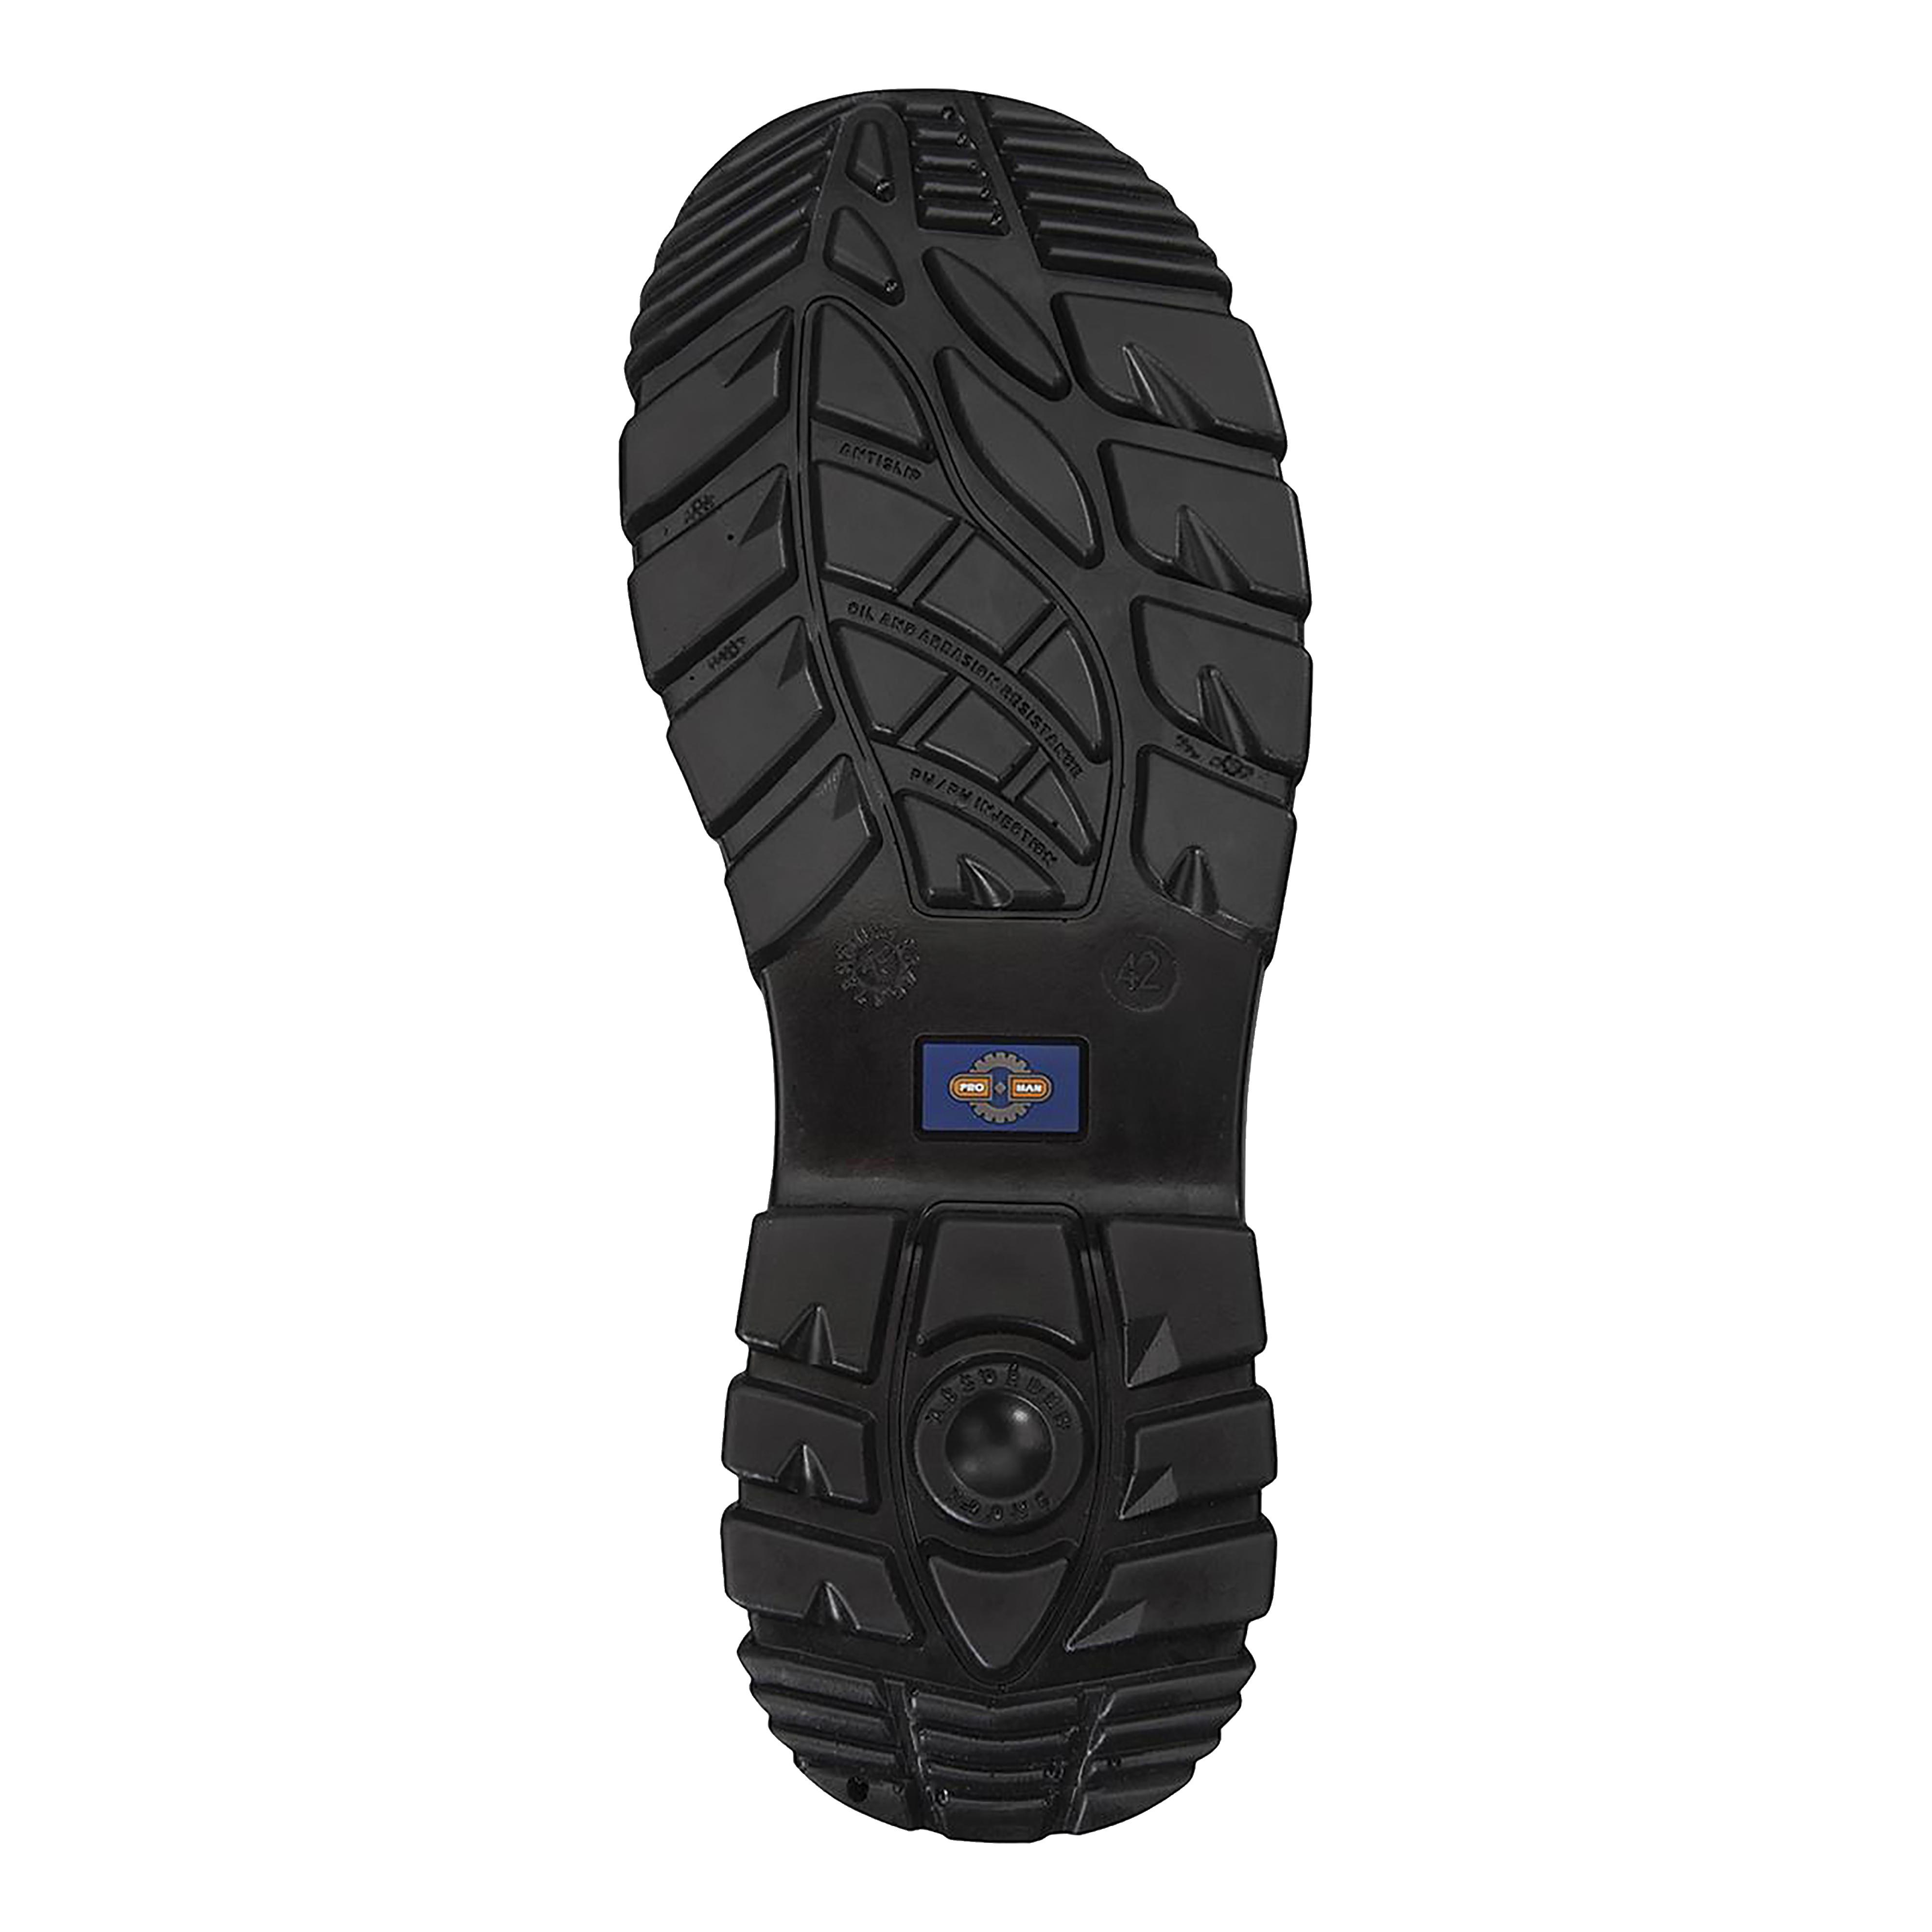 Rockfall ProMan Boot Suede Fibreglass Toecap Black Size 8 Ref PM4020 8